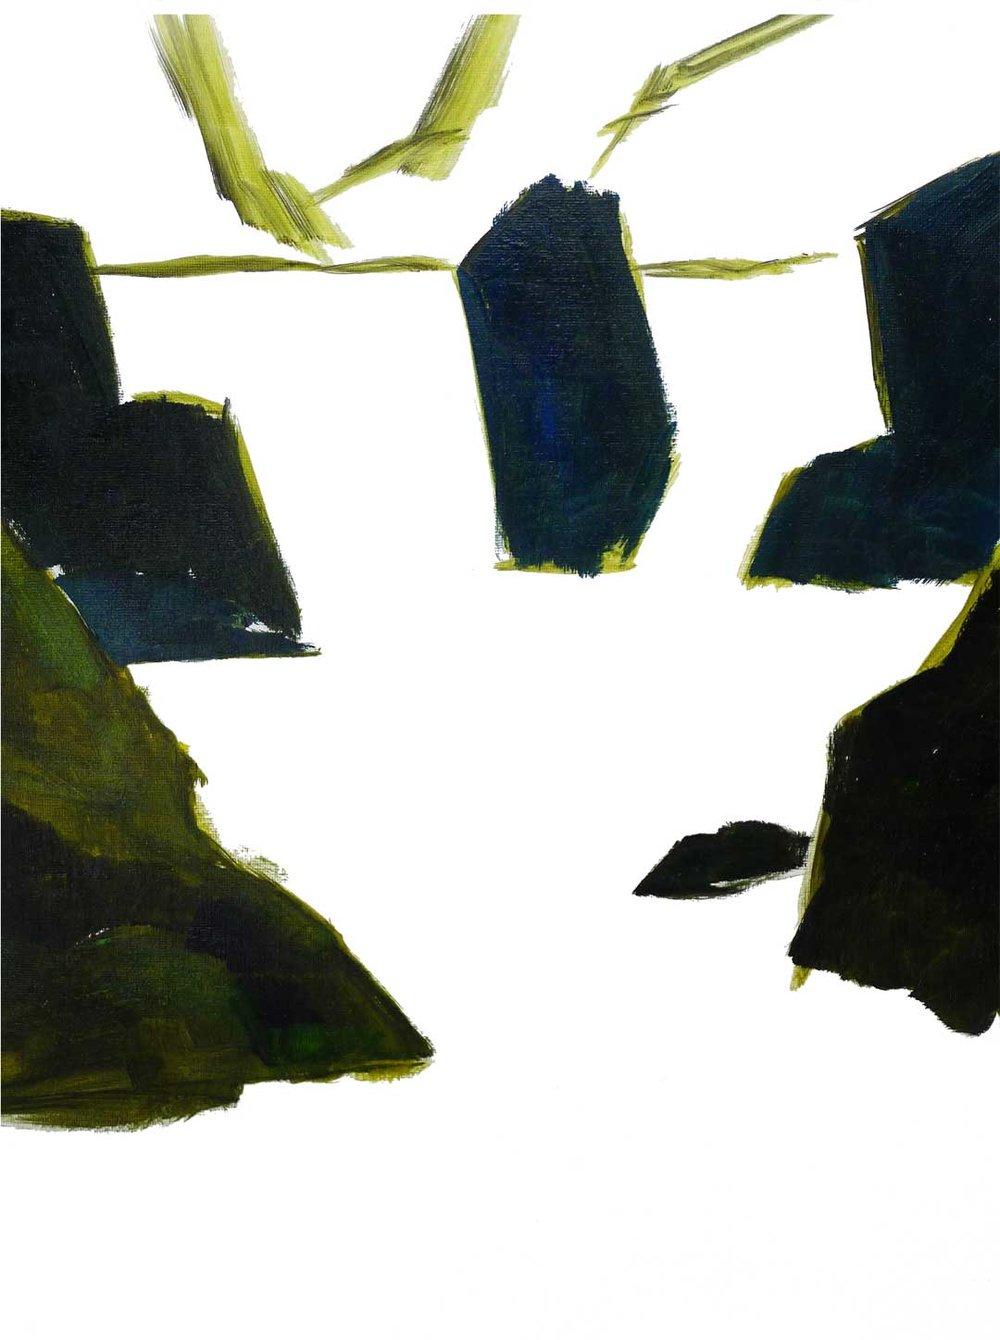 waterfall-paint-demo-1.jpg